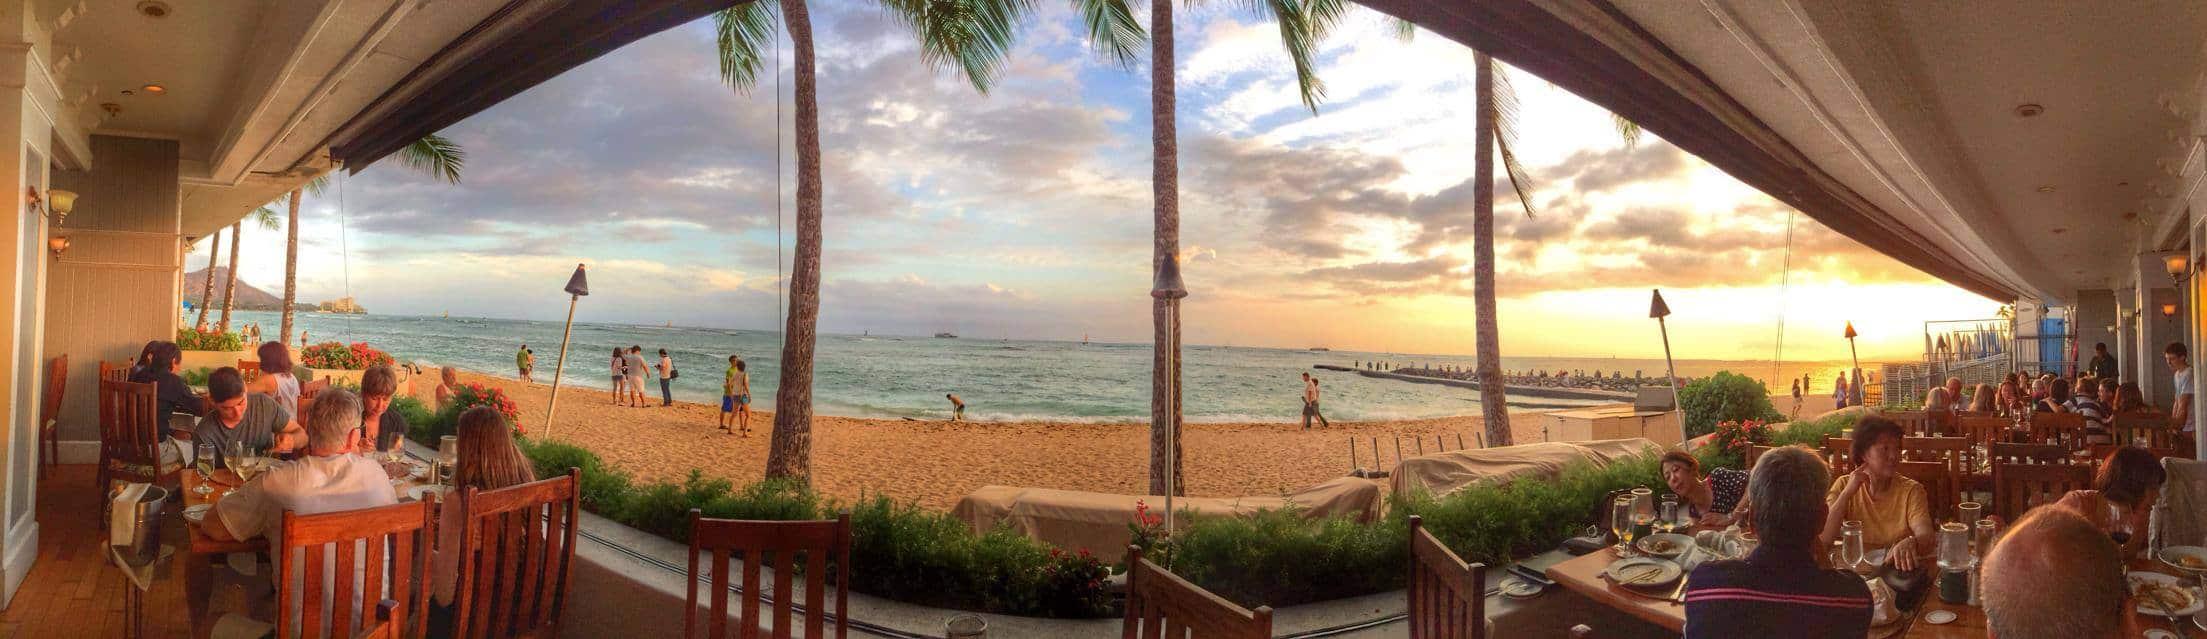 restaurante-ocean-house-havai